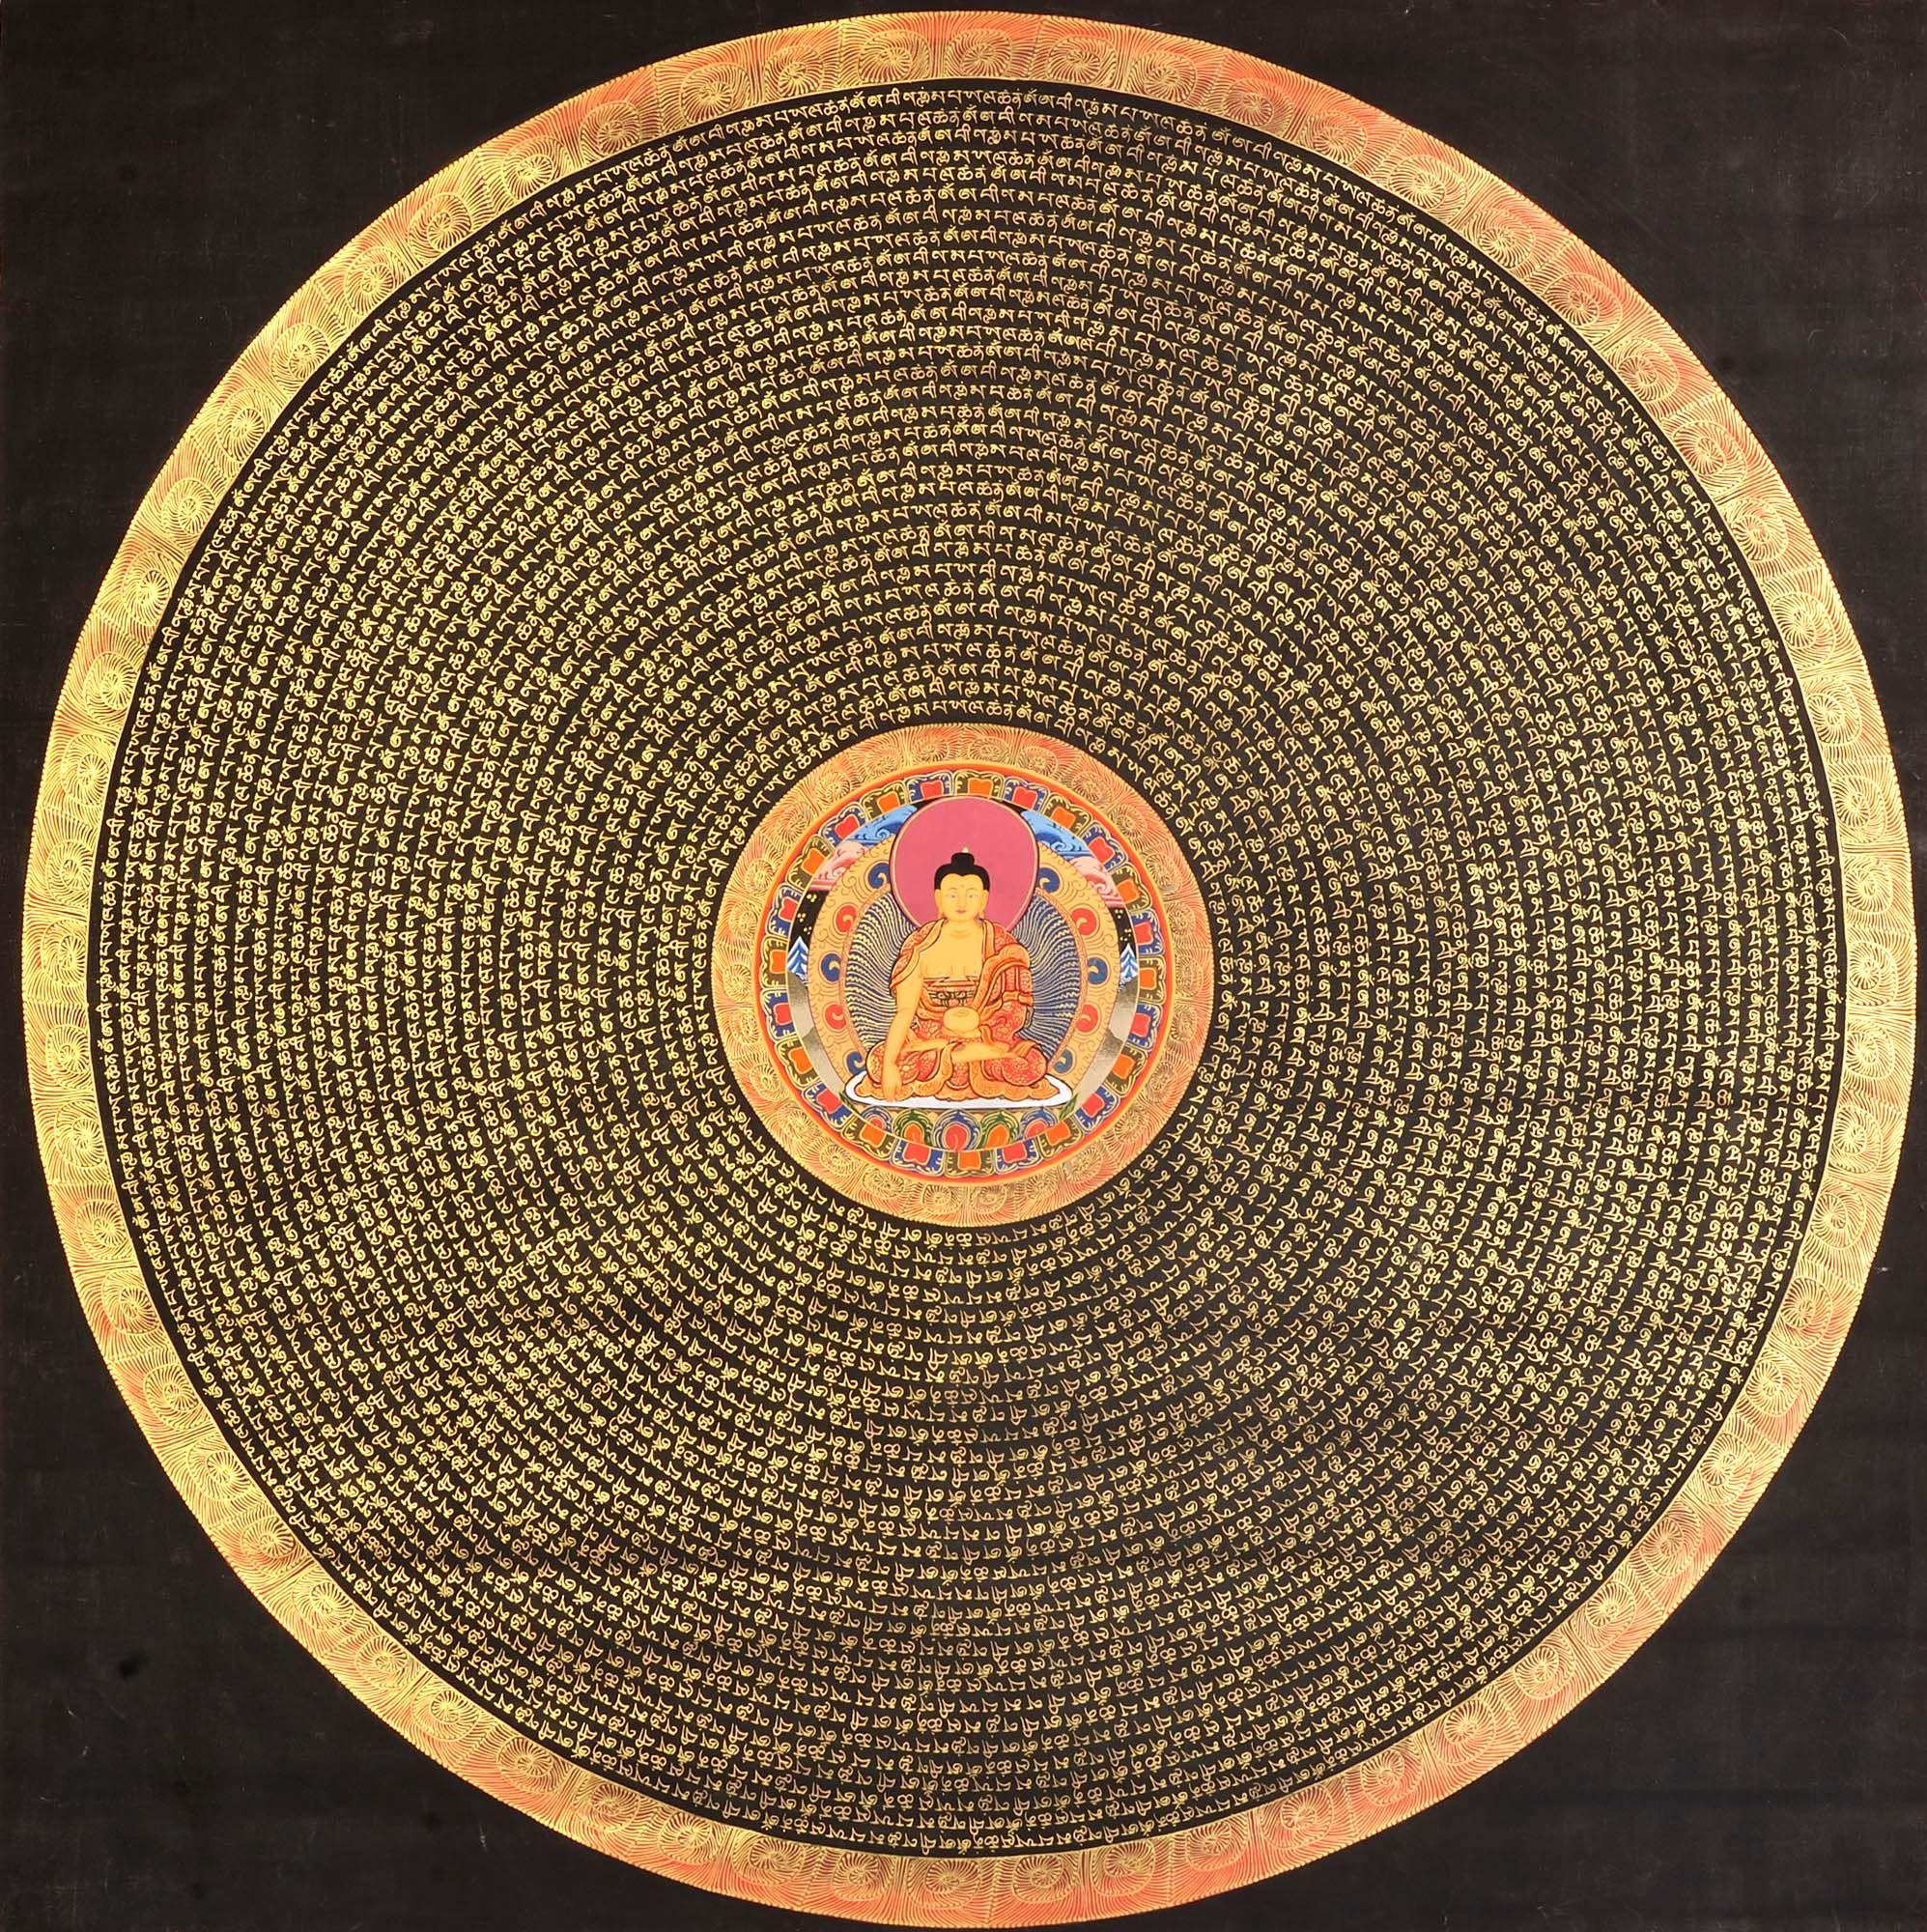 Super Large Mandala of the Buddha (Tibetan Buddhist